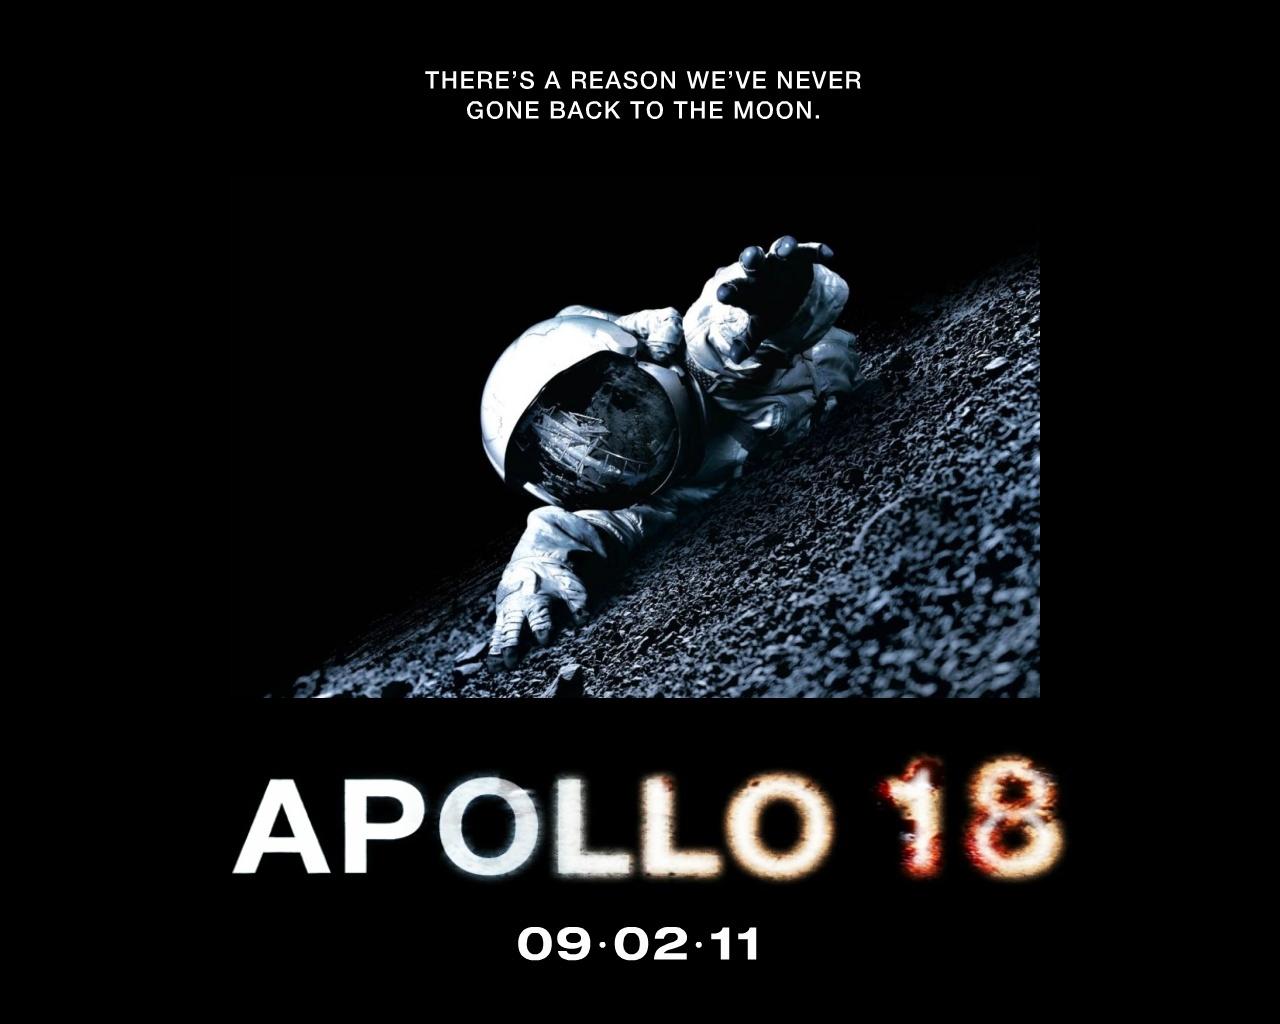 http://2.bp.blogspot.com/-Kd9j4GyG1H4/TwvZcWQnRHI/AAAAAAAAEVk/kdA3Wt3GzVY/s1600/Apollo-18-Wallpaper-03.jpg